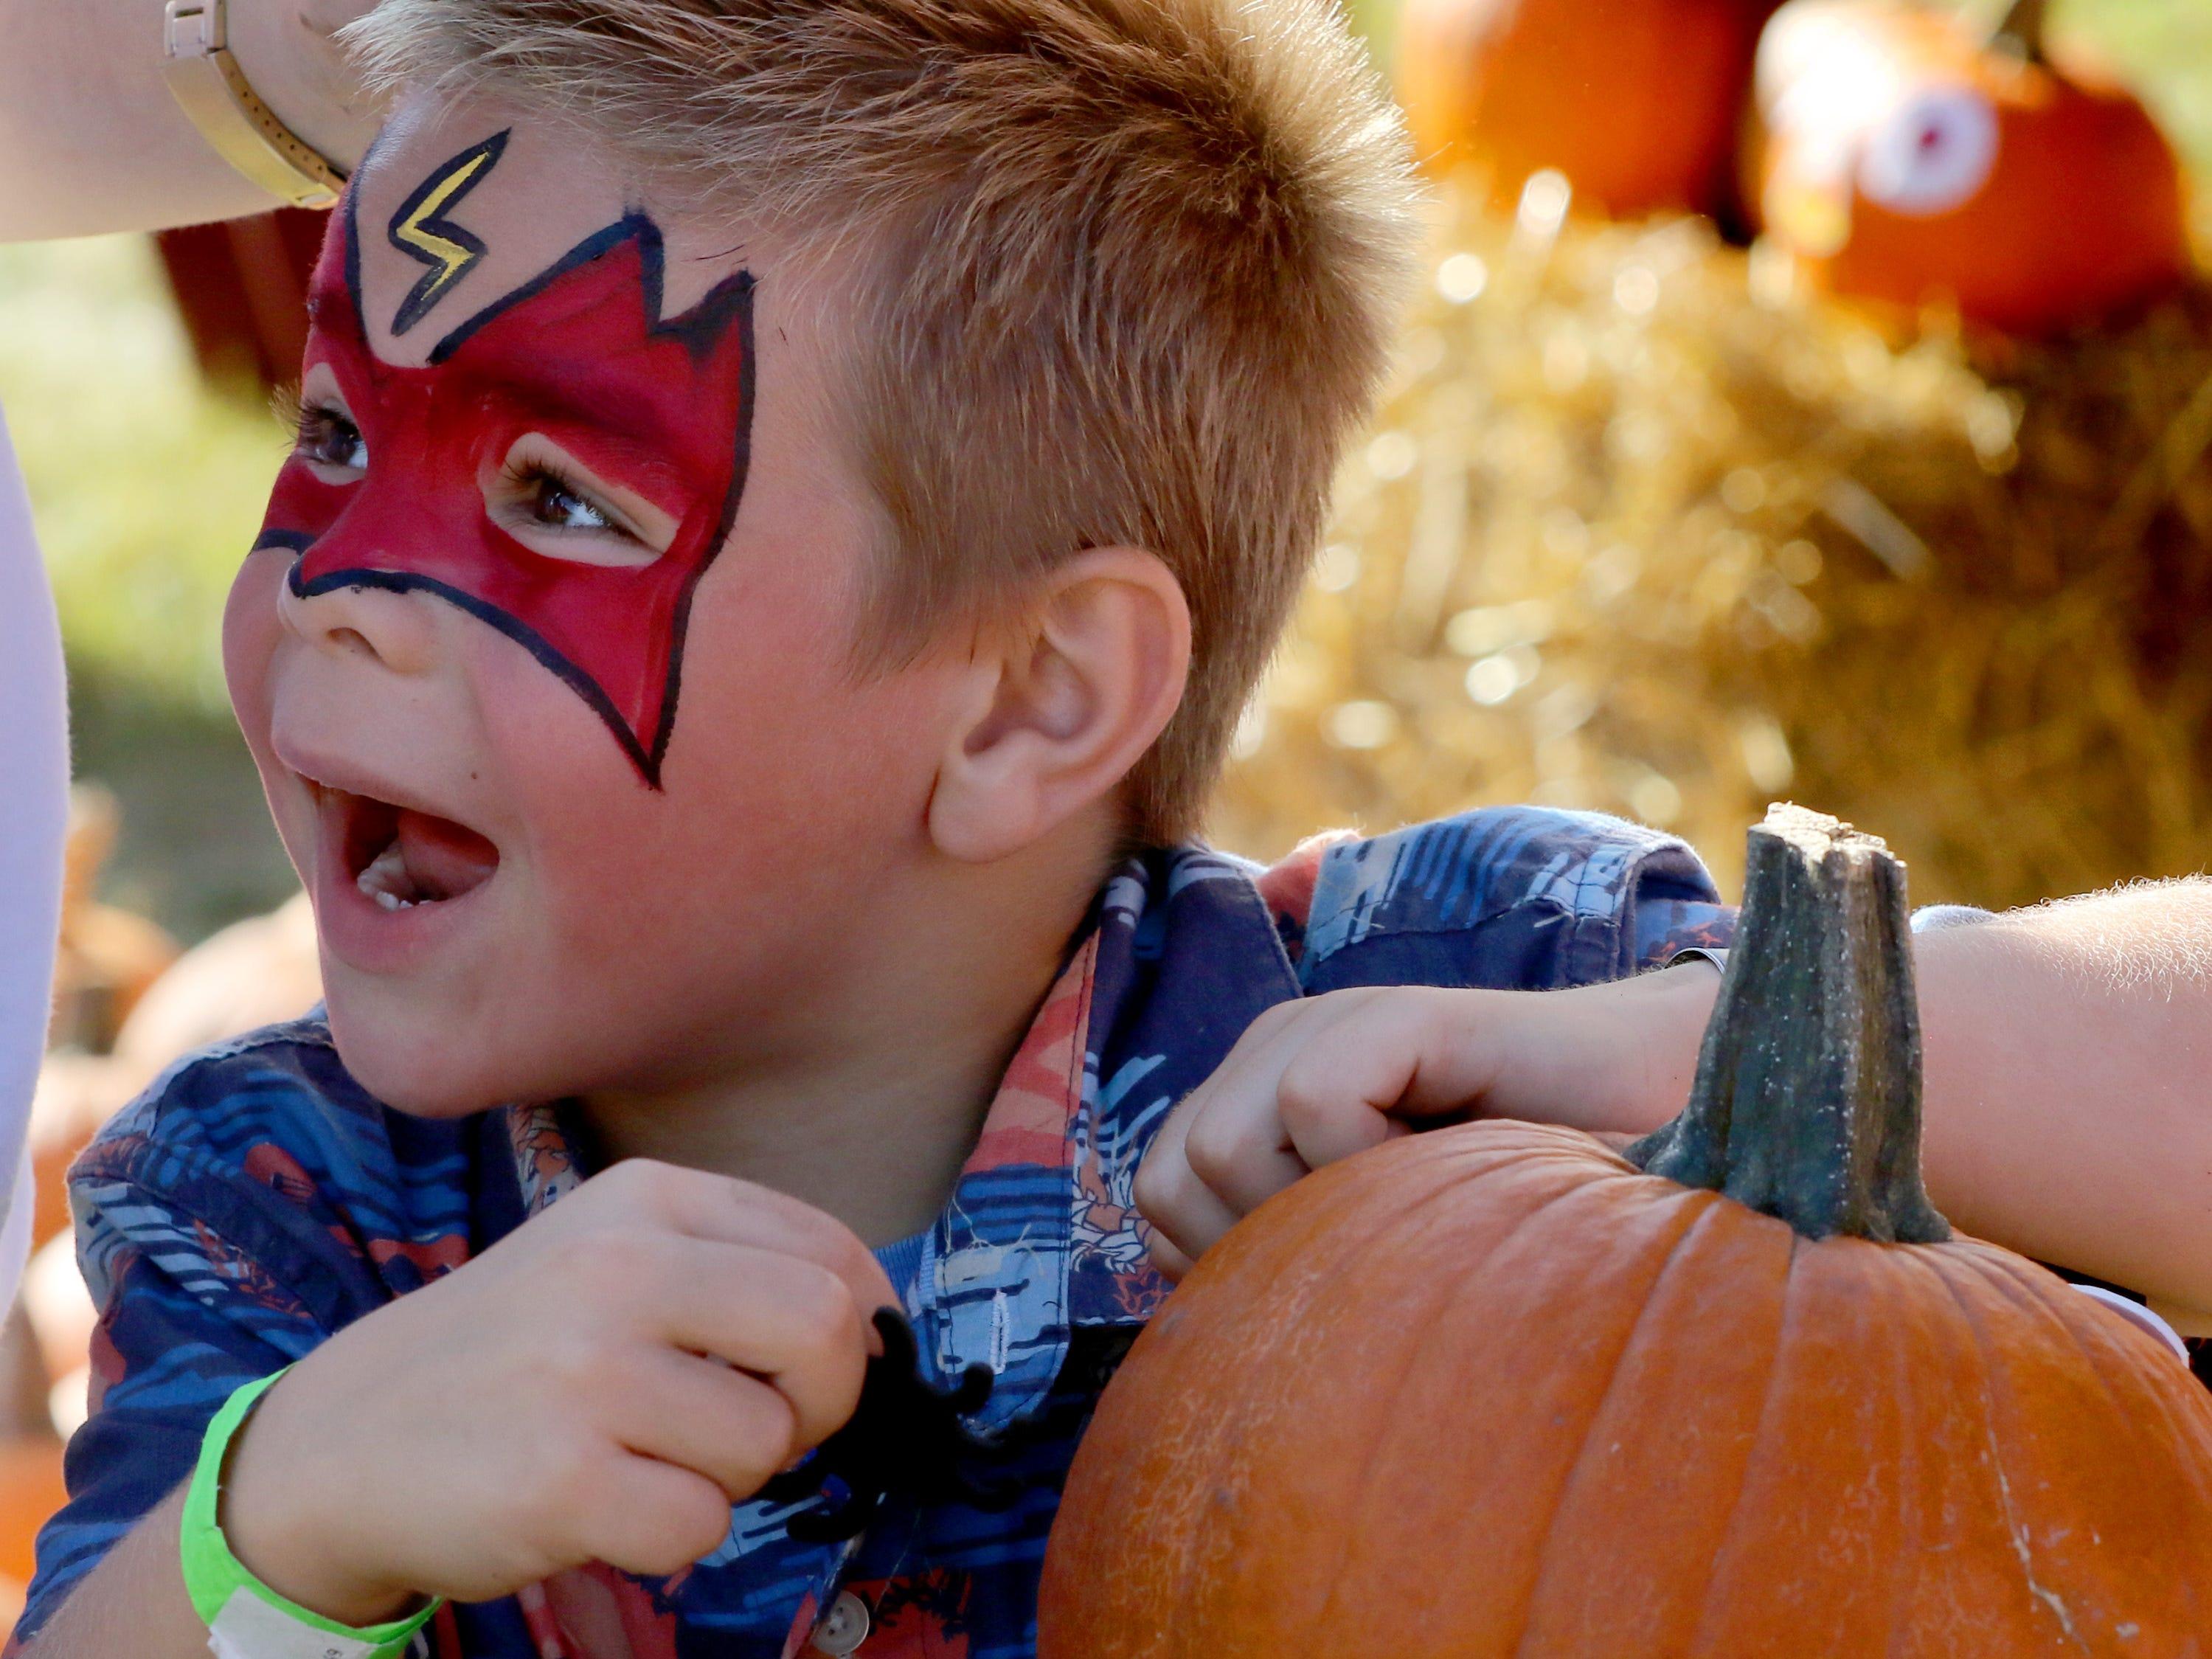 Gabriel Matus, 6, decorates a pumpkin during St. Joseph Catholic Parish's Oktoberfest in Wauwatosa on Sept. 15.